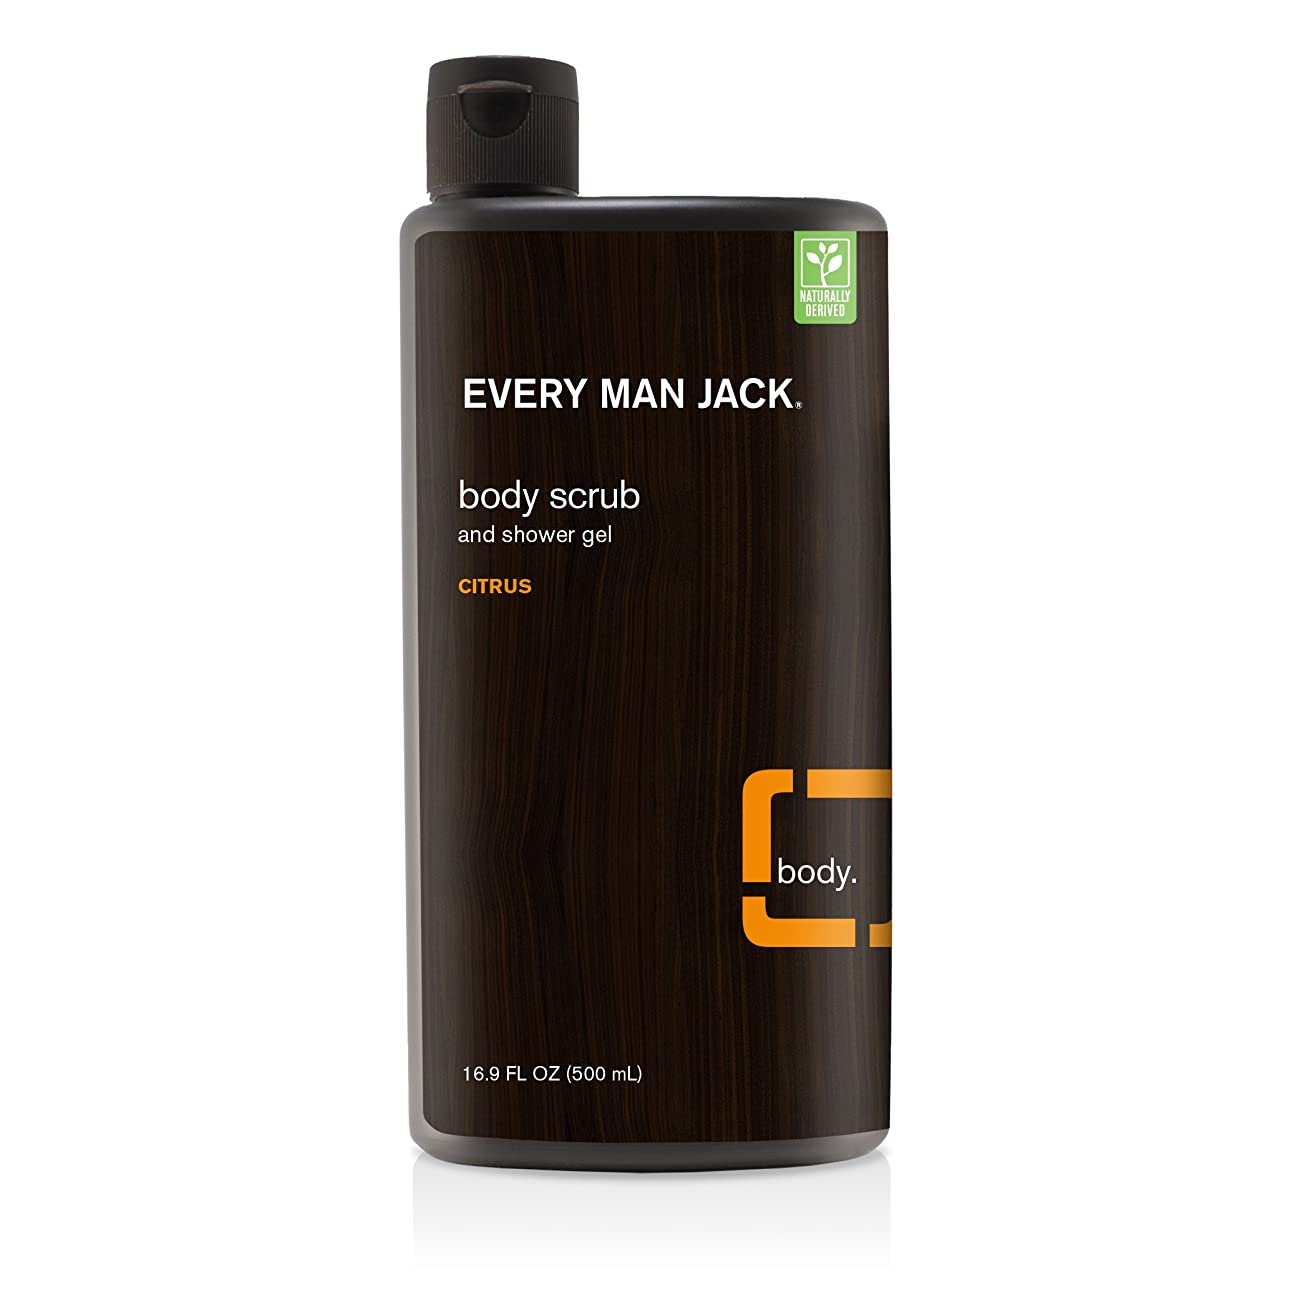 女性逸脱ボリュームEvery Man Jack Citrus Body Scrub 473 ml (並行輸入品)